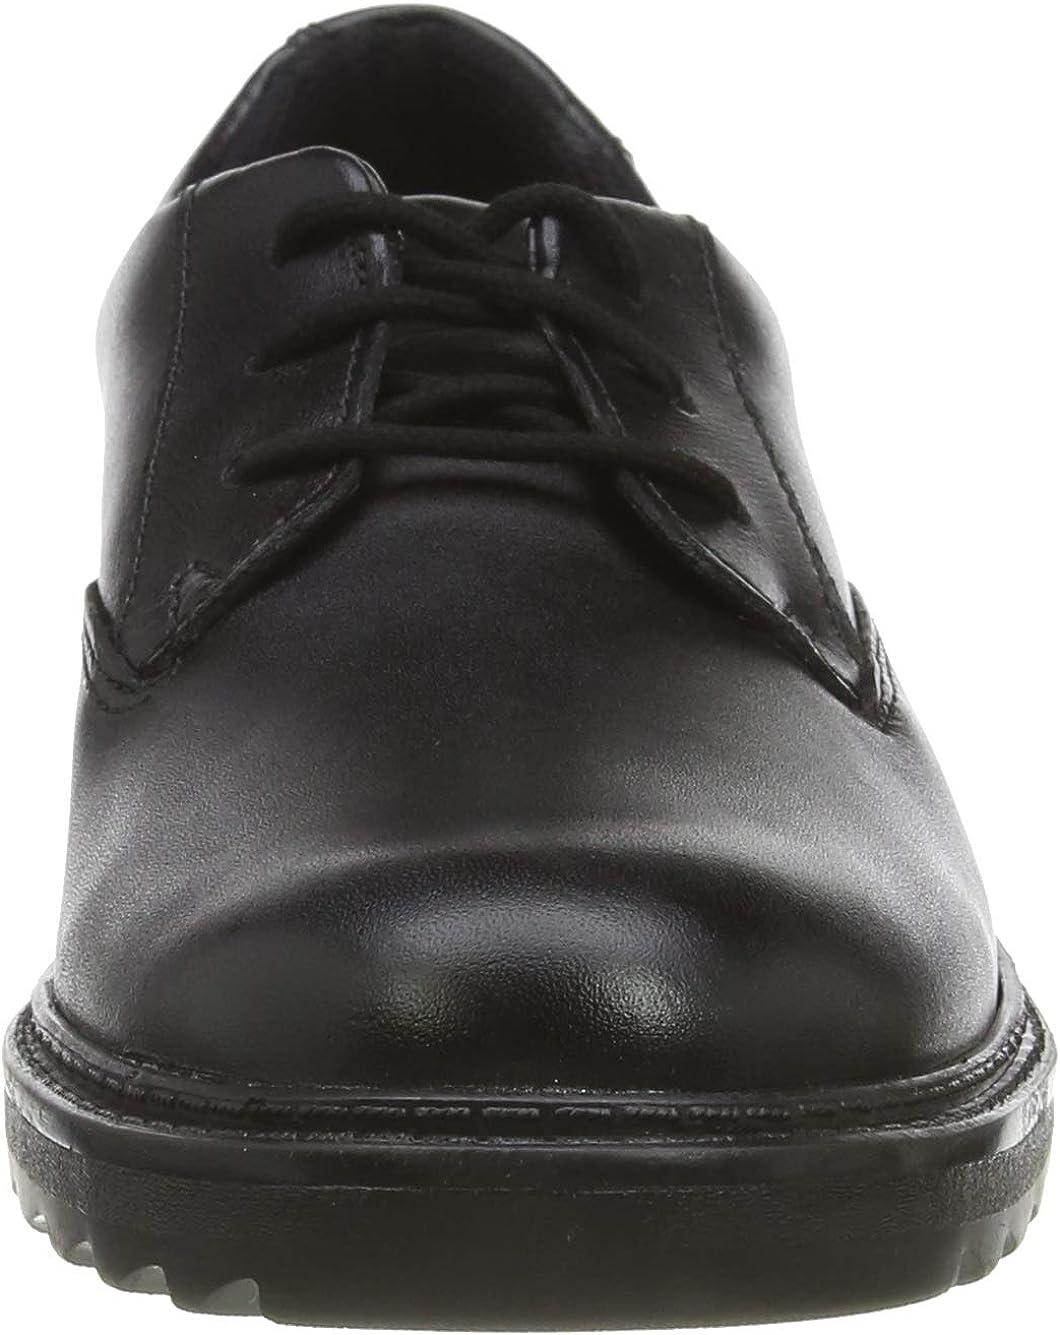 Derbys gar/çon 40 EU Clarks Asher Jazz Y Noir Black Leather Black Leather